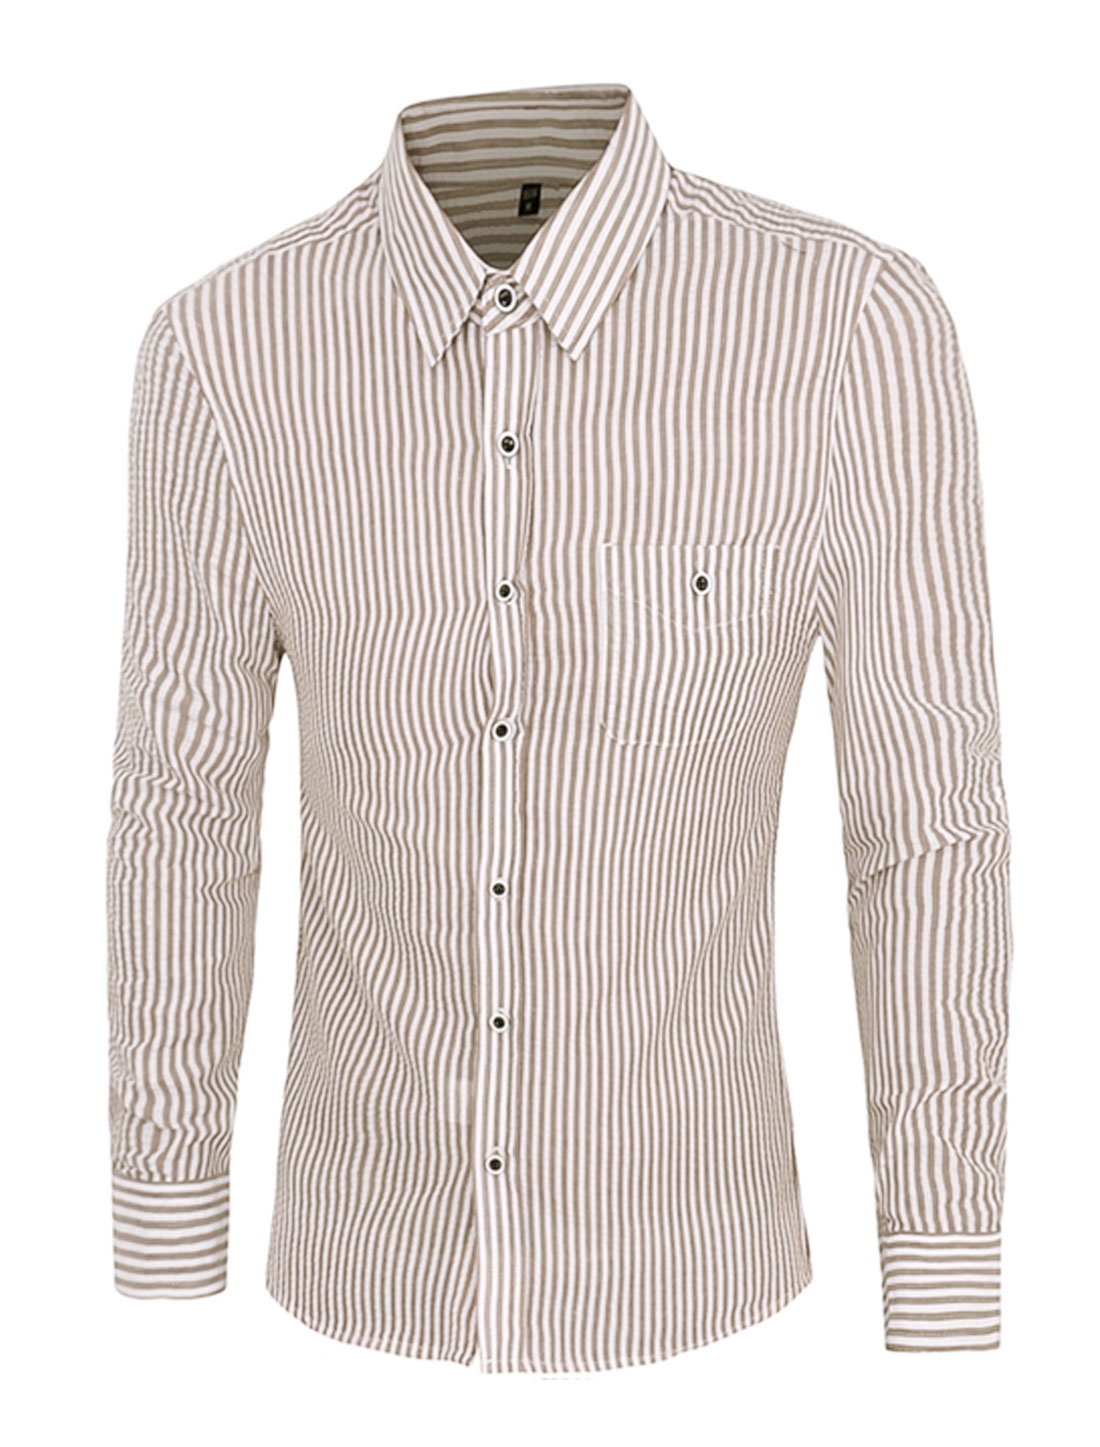 Men Button Closure Stripes Long Sleeve Slim Fit Shirt Brown M